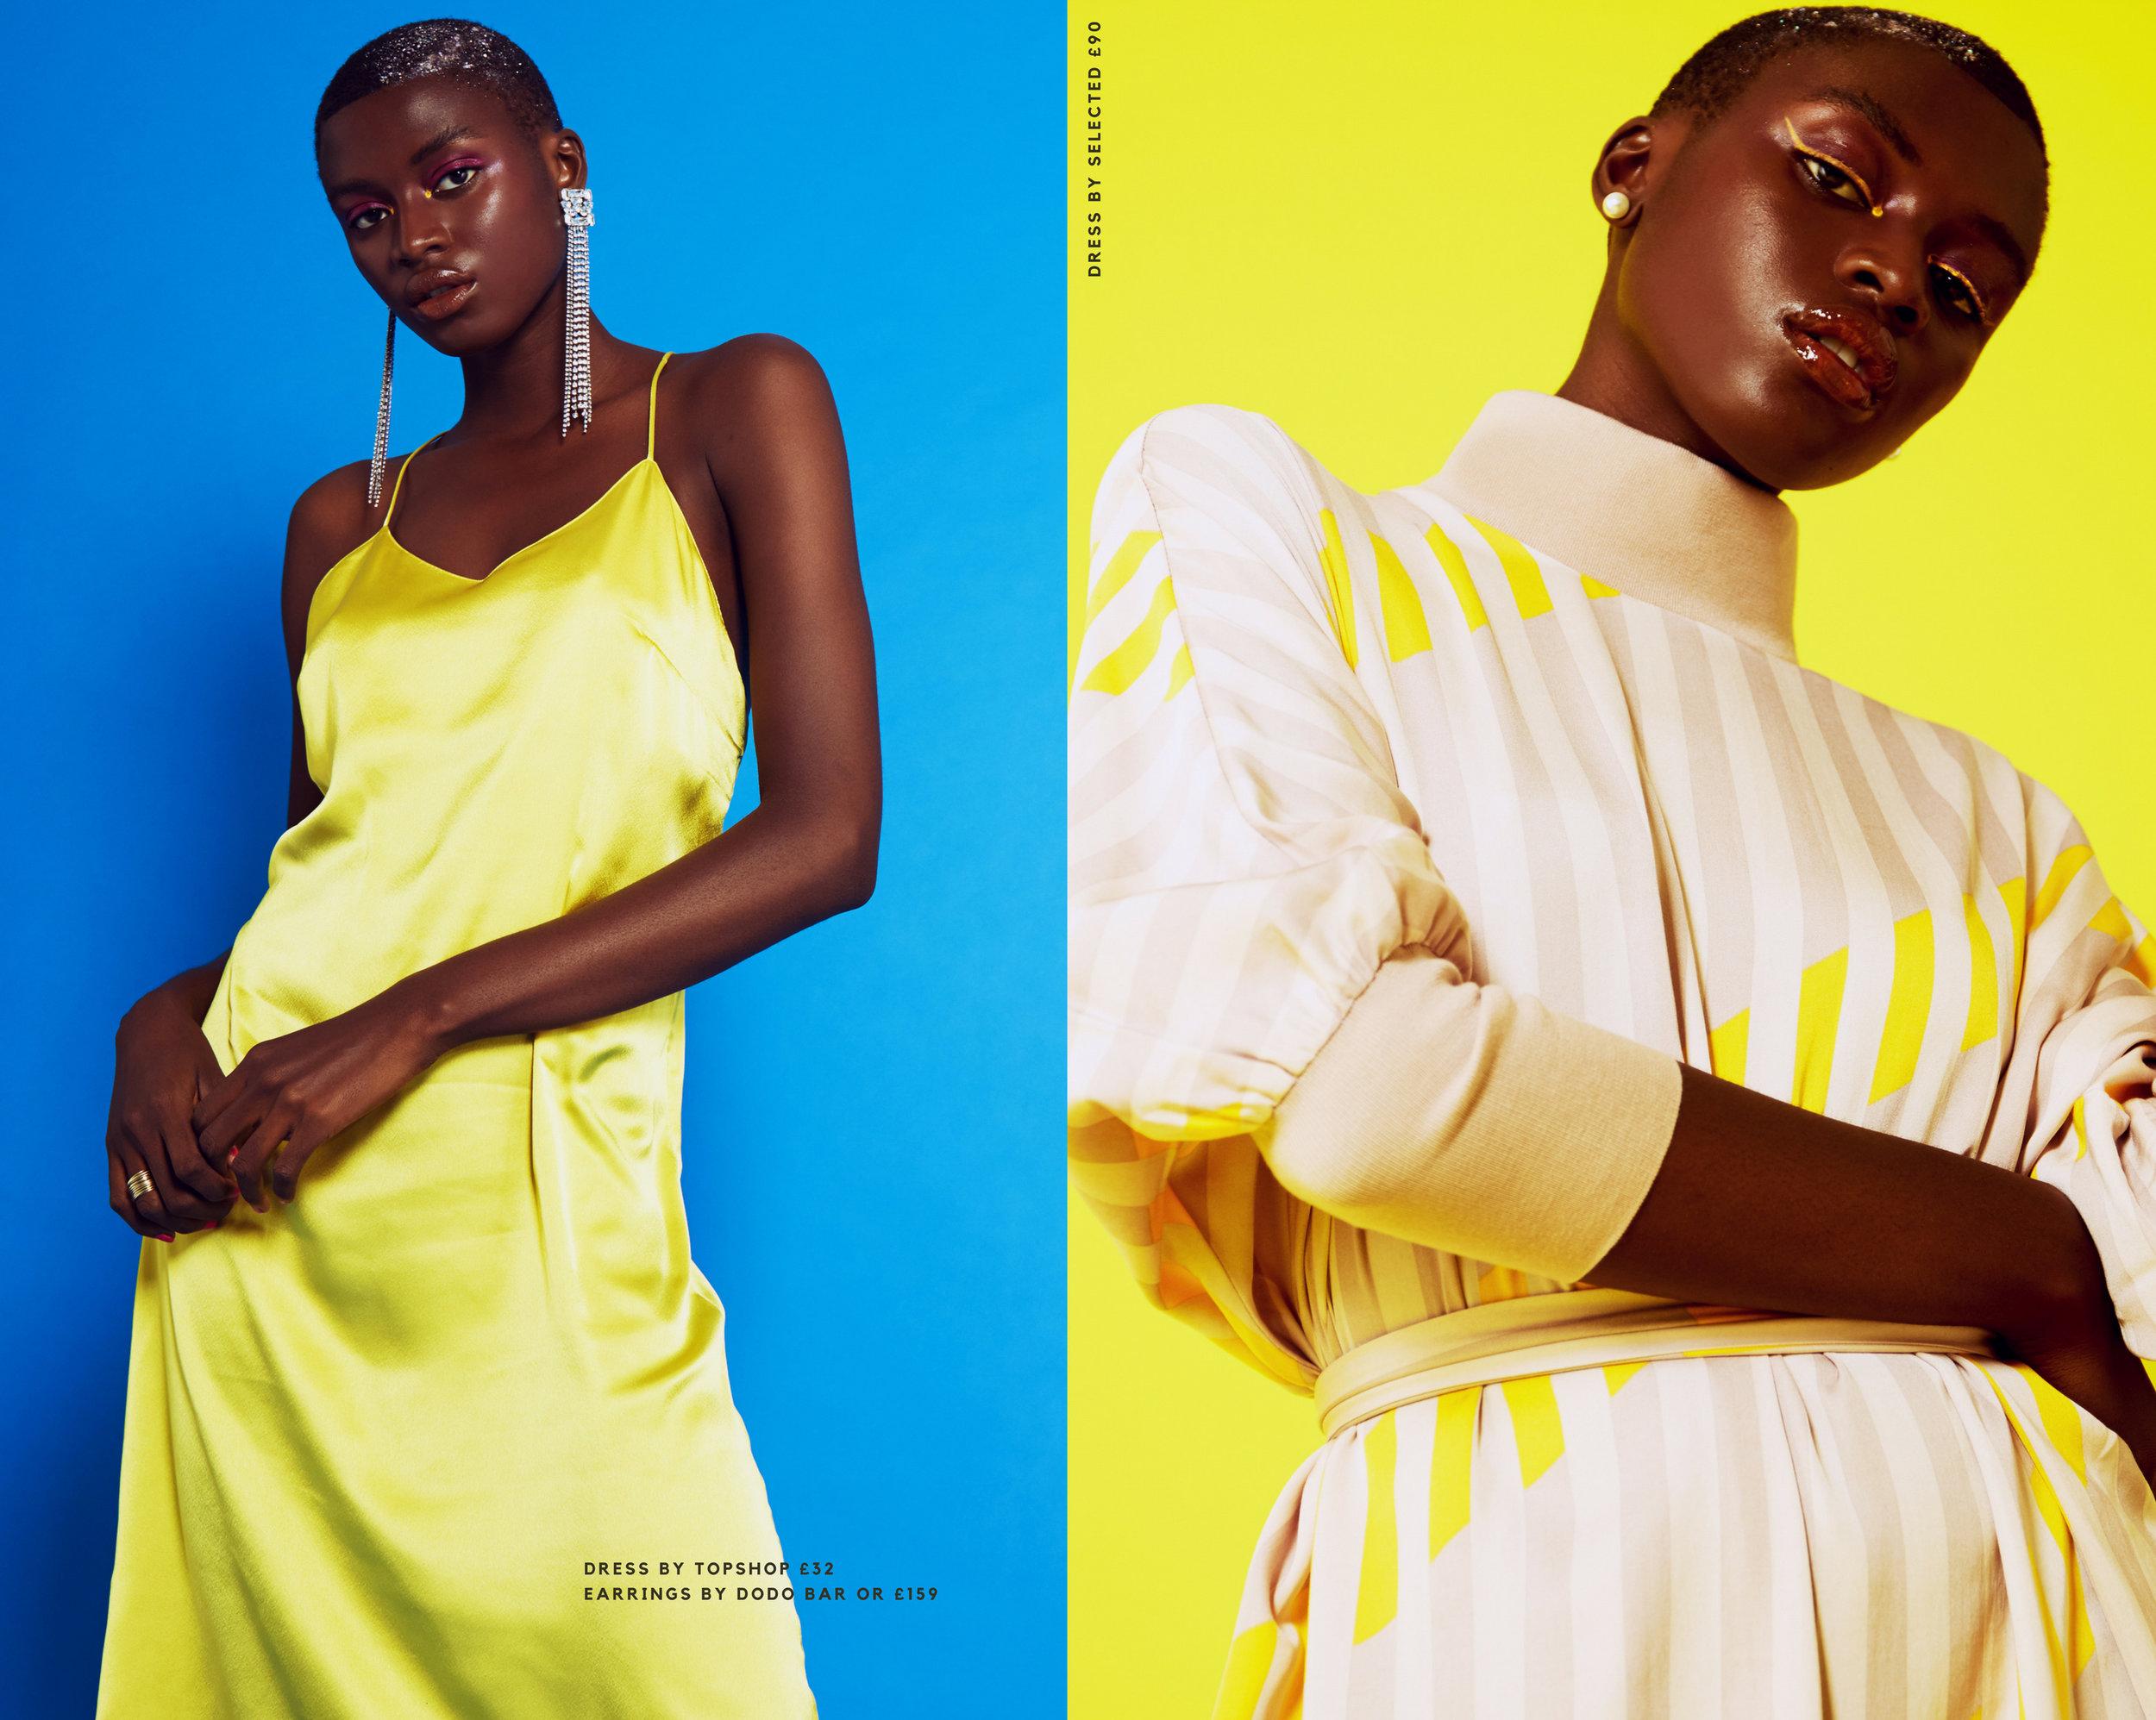 Bold+Beginnings+Fashion+Editorial+4.jpg